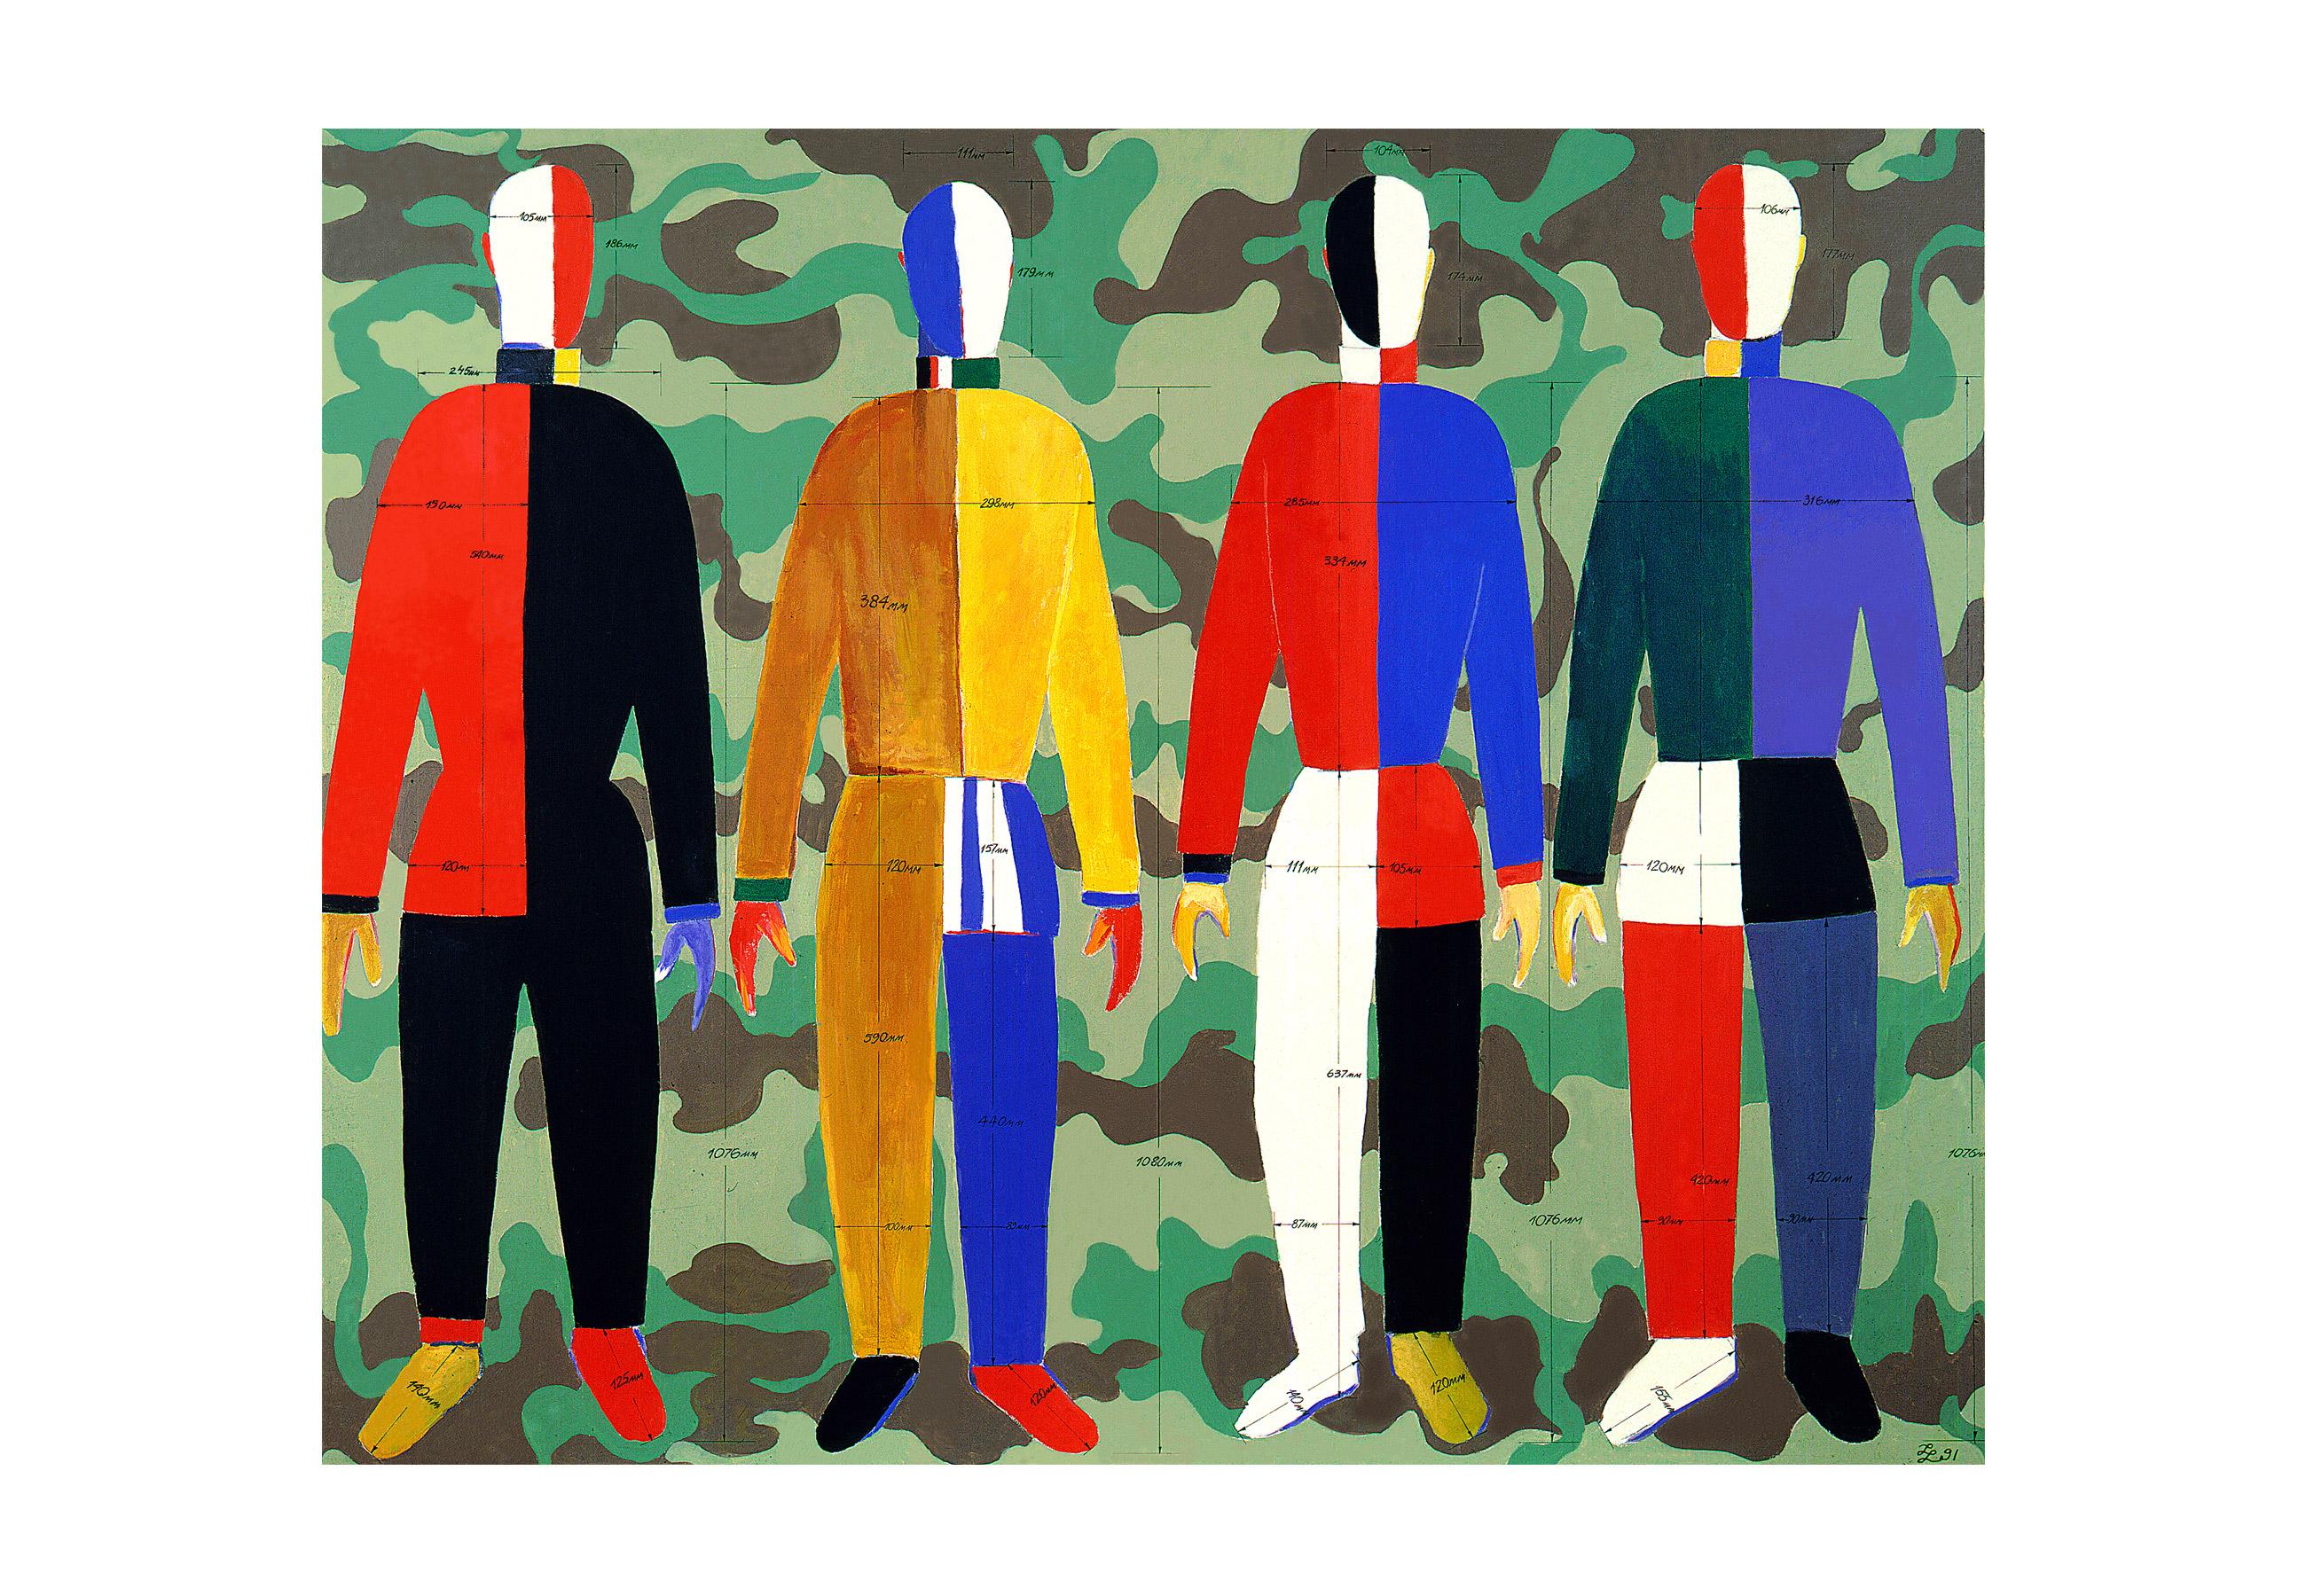 Lamm-Portfolio-1990-1996-11.jpg